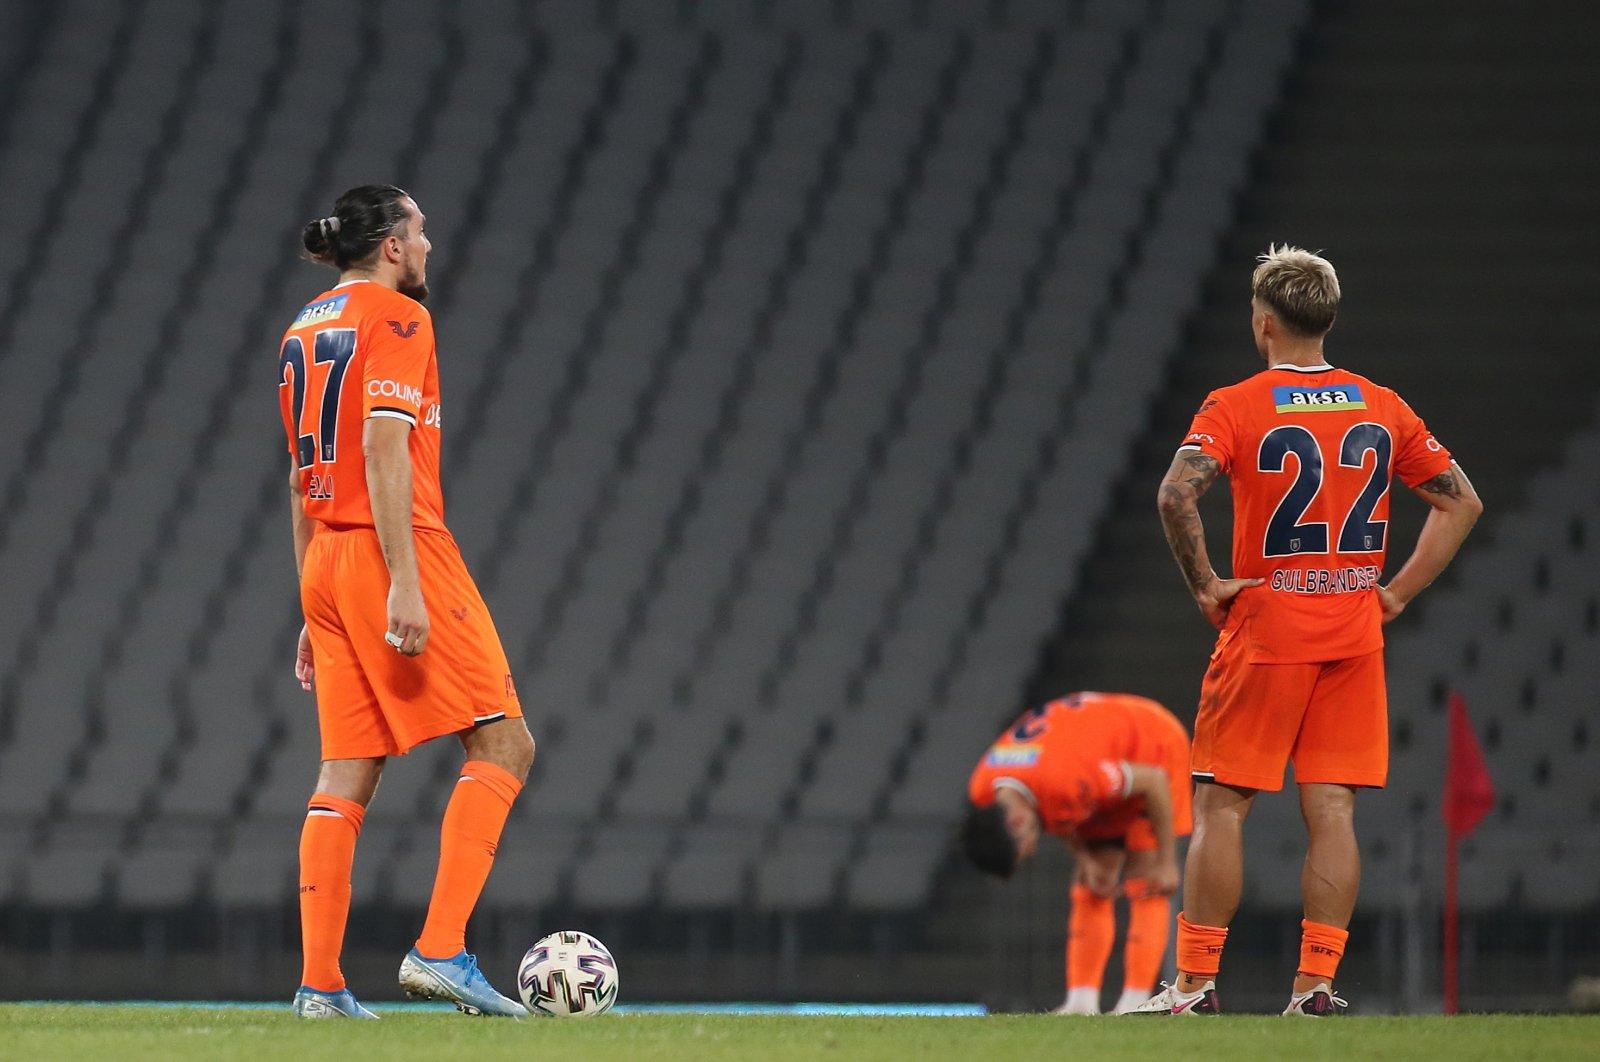 Başakşehir's Enzo Crivelli (L) and Fredrik Gulbrandsen react after a Süper Lig match against Fatih Karagümrük, in Istanbul, Turkey, Sept. 25, 2020. (AA Photo)